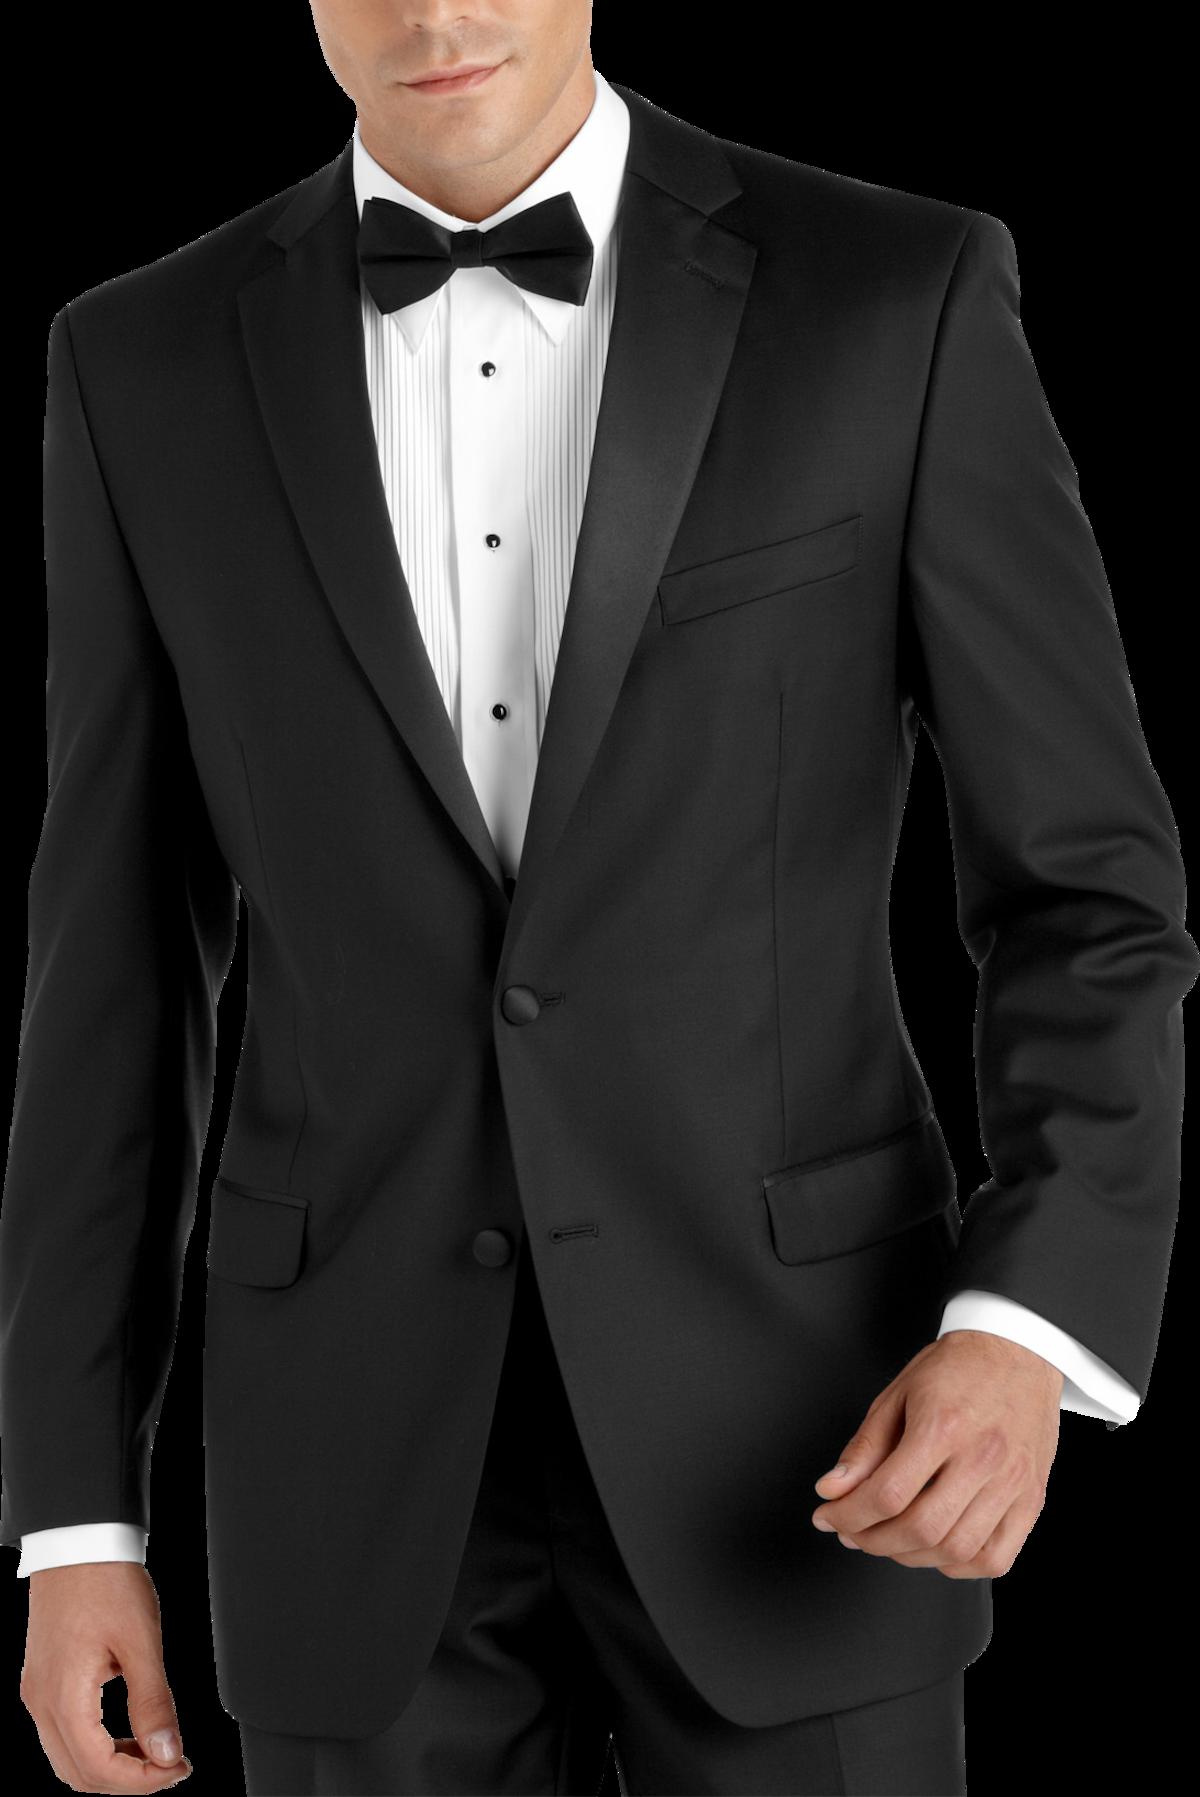 100% wool black slim fit tuxedo - men's tuxedos - calvin klein